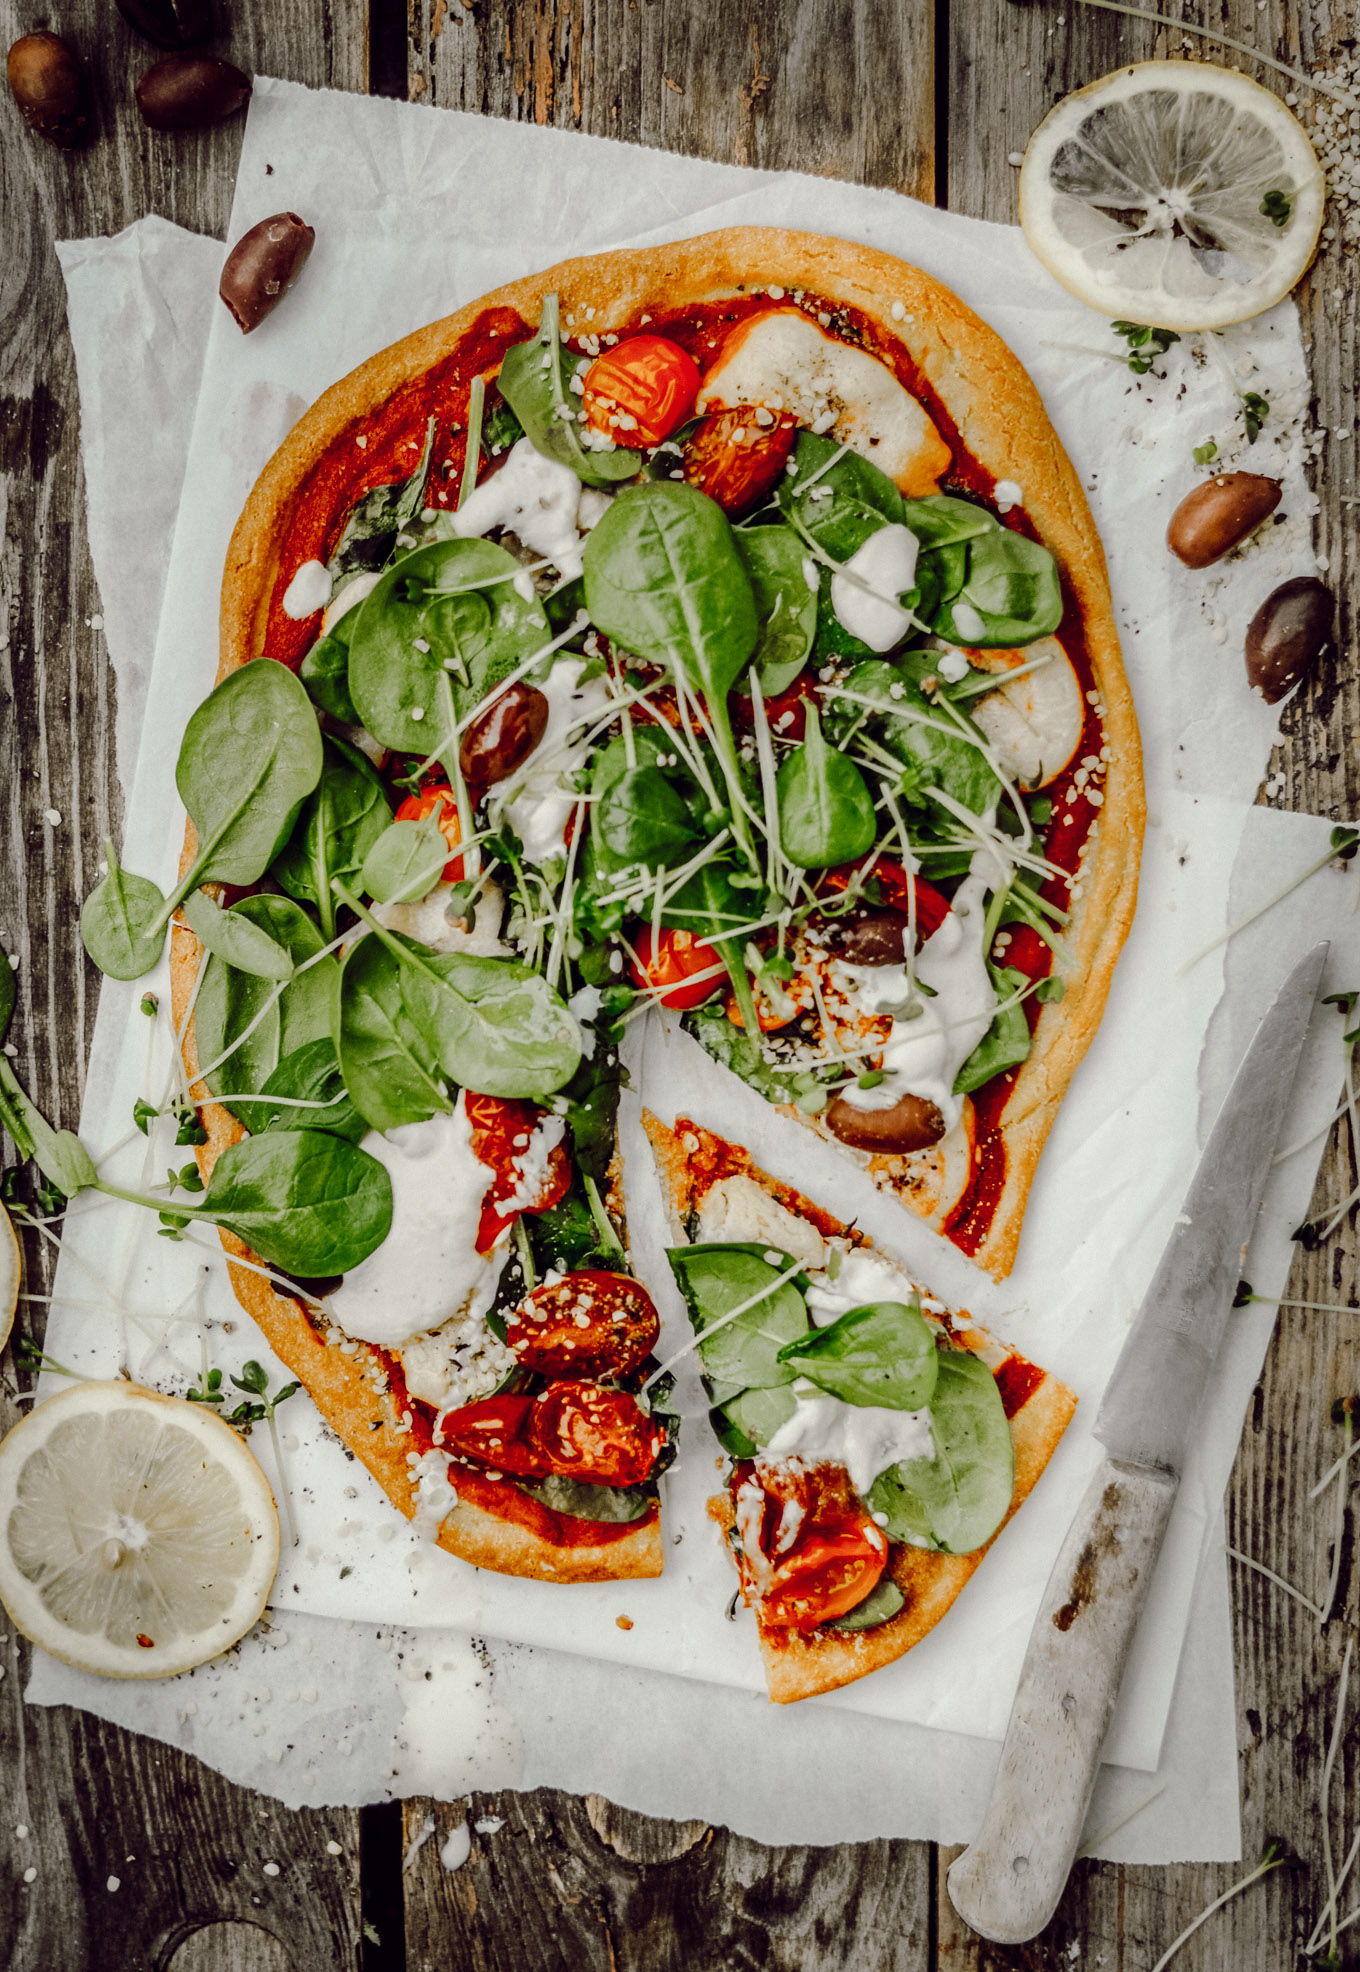 der ultimative knusprige pizzaboden aus quinoa rezept f r spinat pizza mit cashew cream. Black Bedroom Furniture Sets. Home Design Ideas